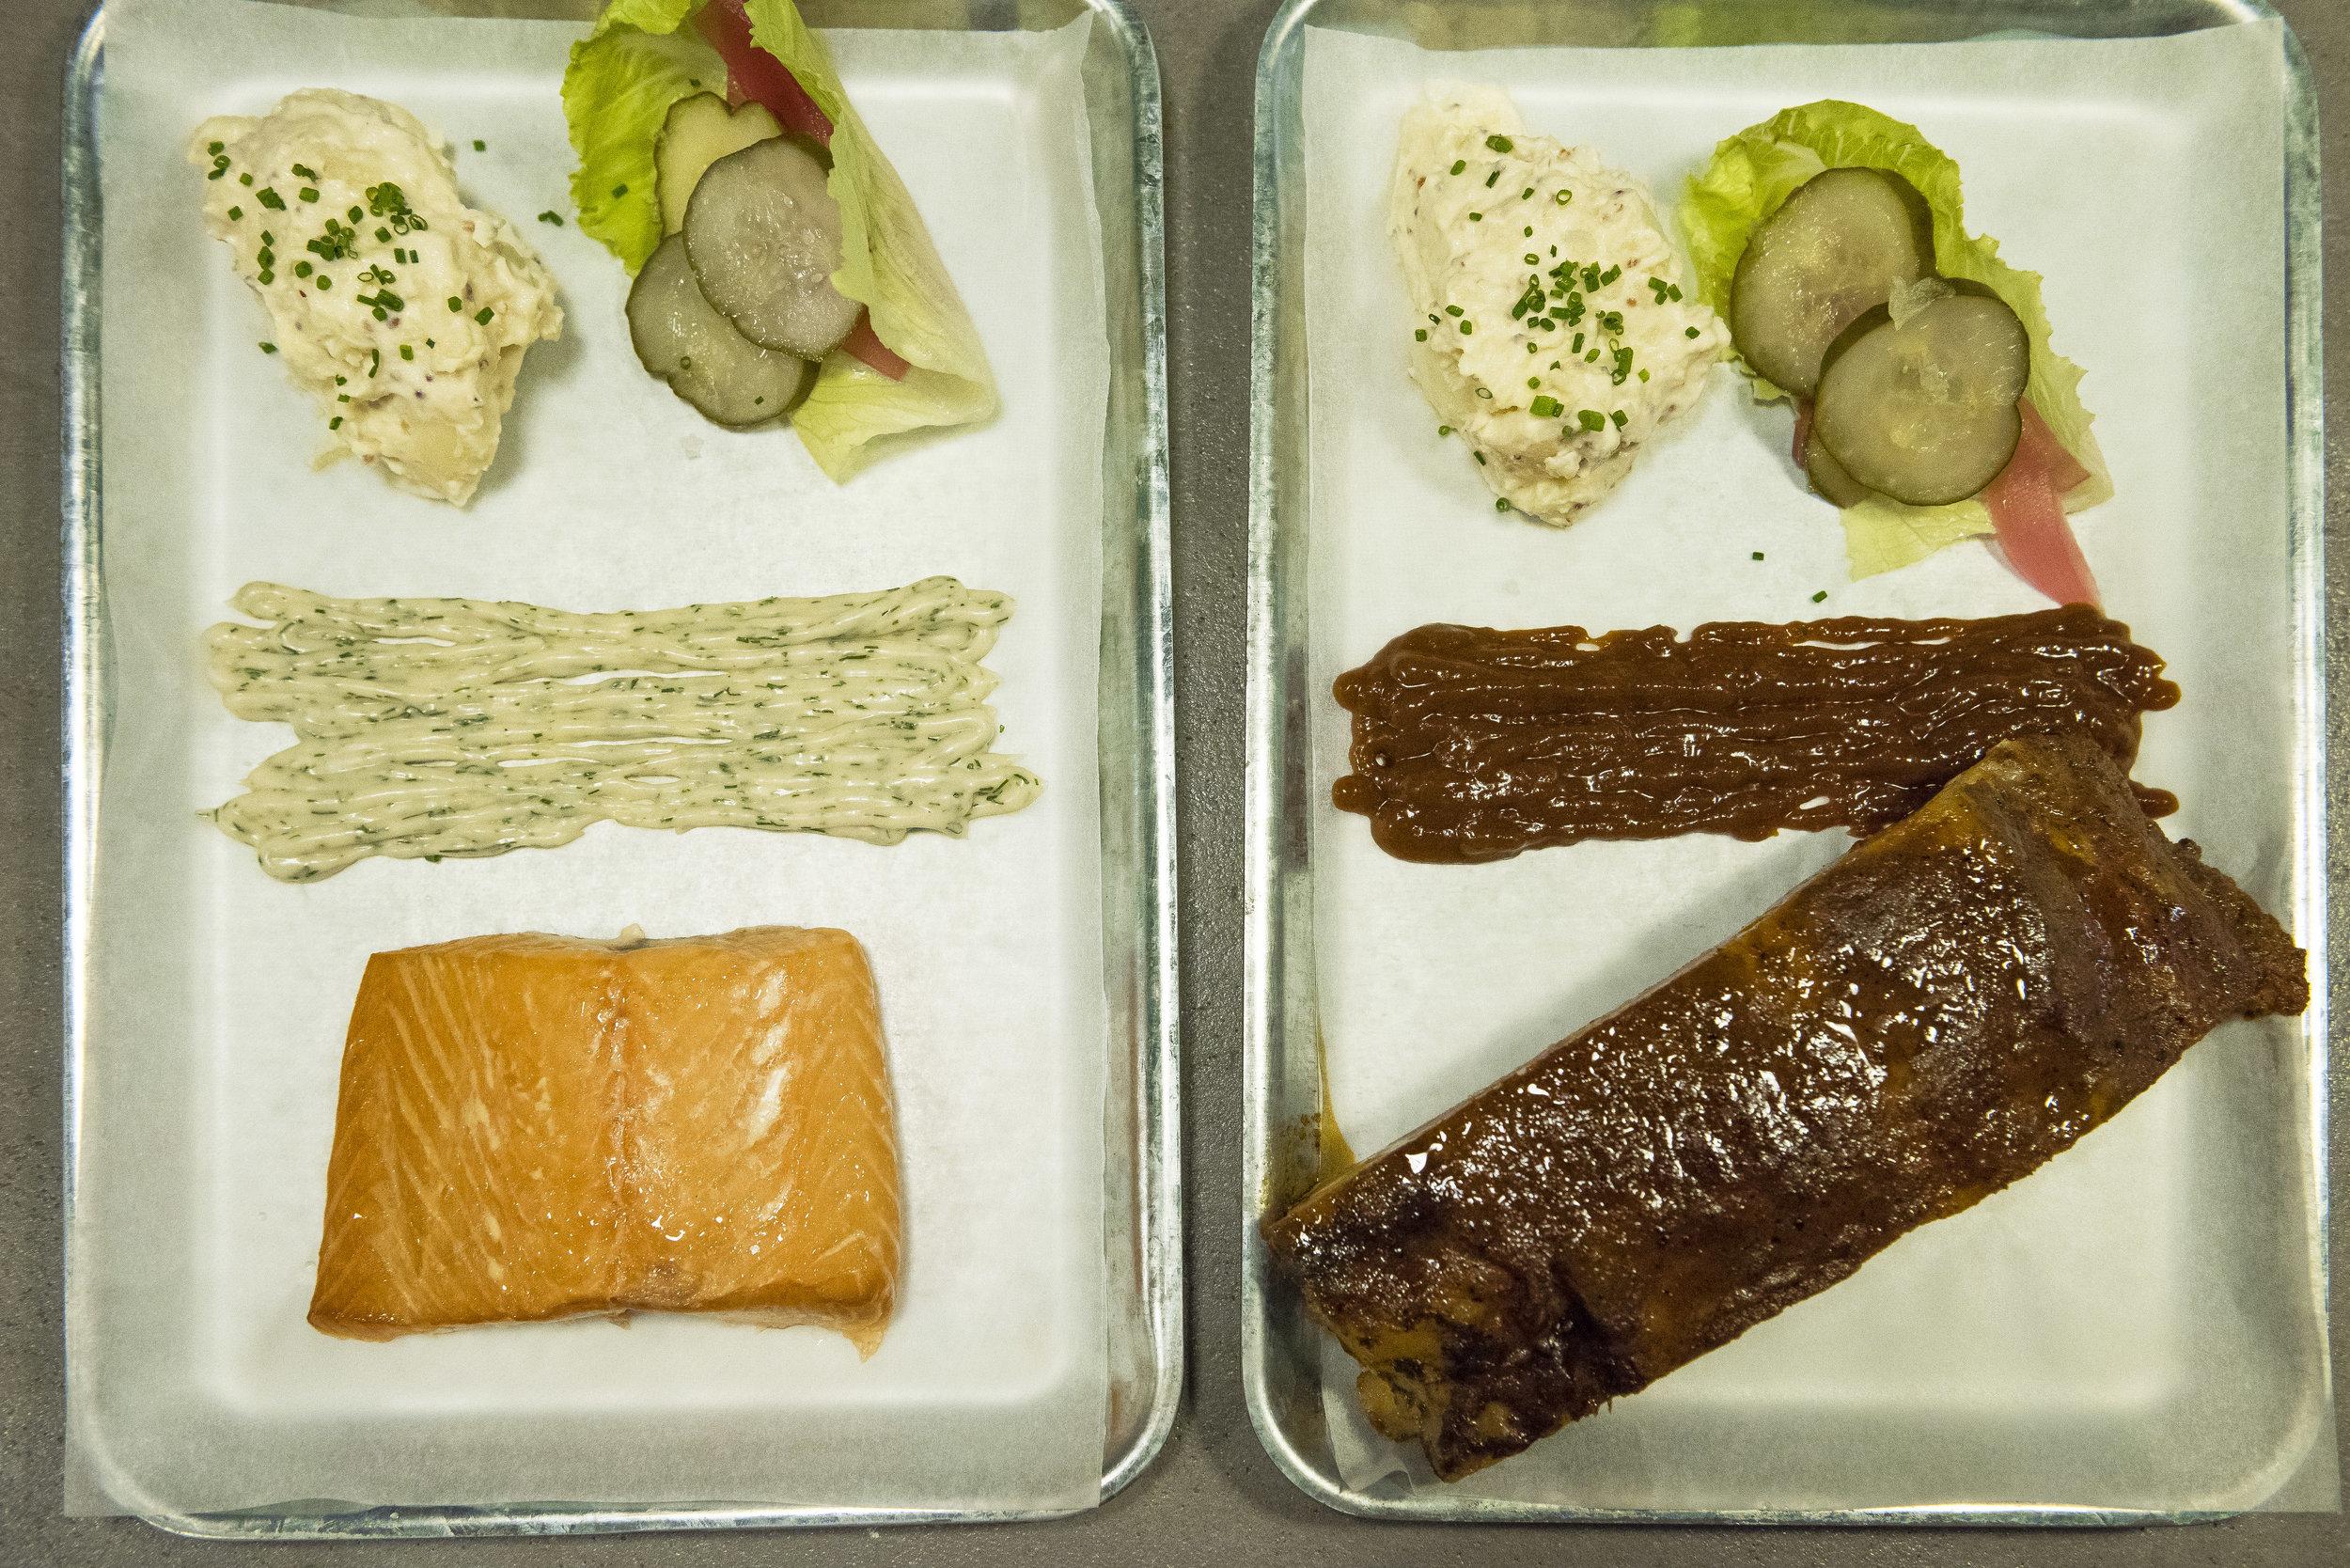 Hot-smoked salmon with dill tartar and potato salad, and smoked ribs with bbq sauce at Olofson, Barcelona. Photo © Barcelona Food Experience